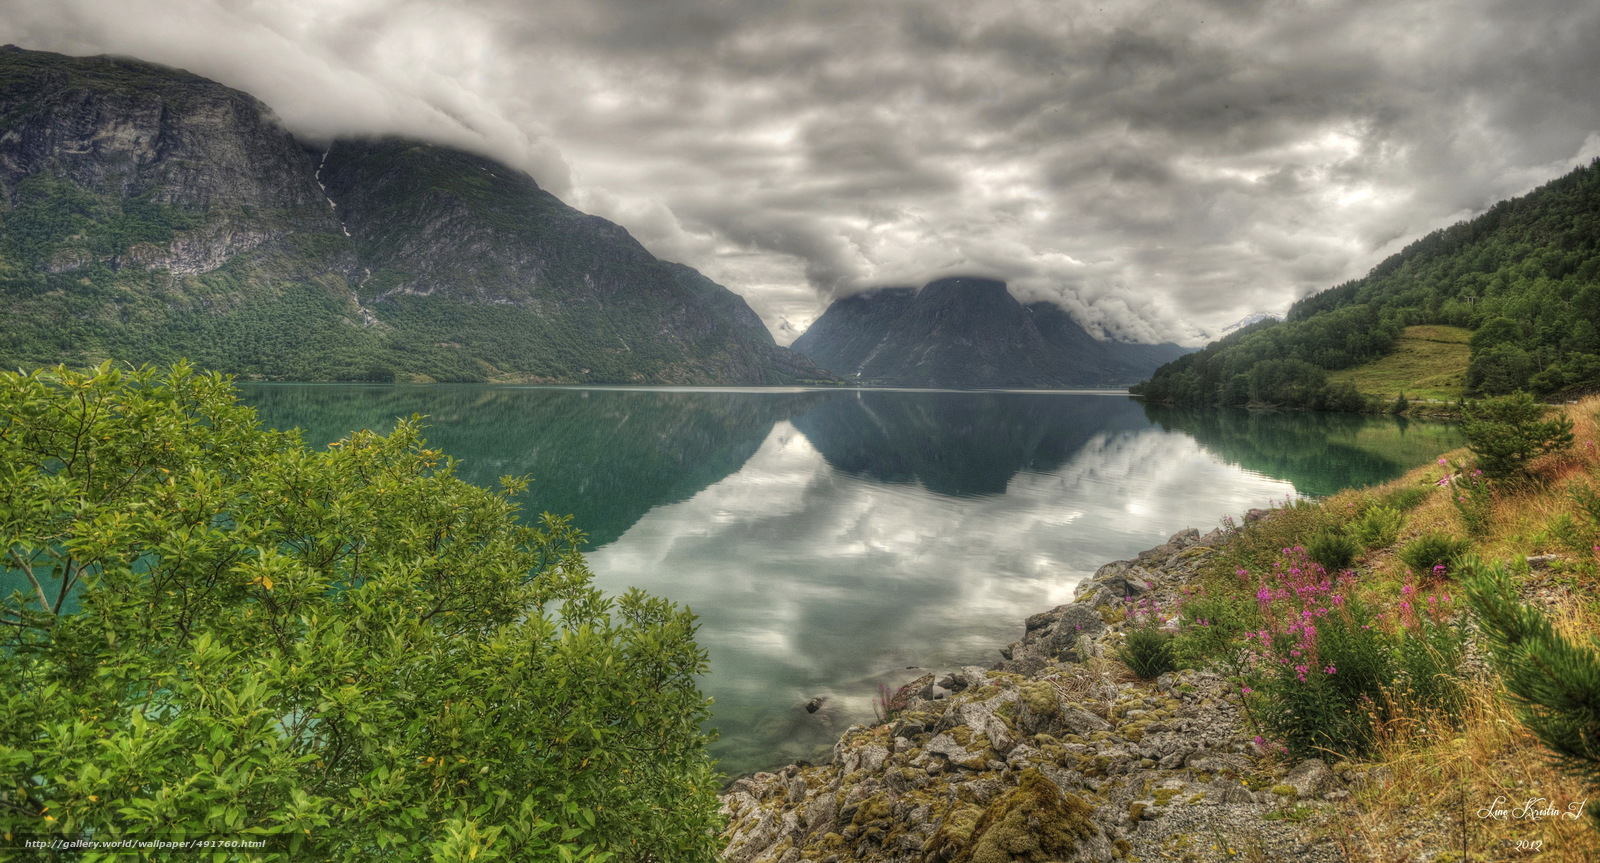 pics photos strynsvatnet - photo #14